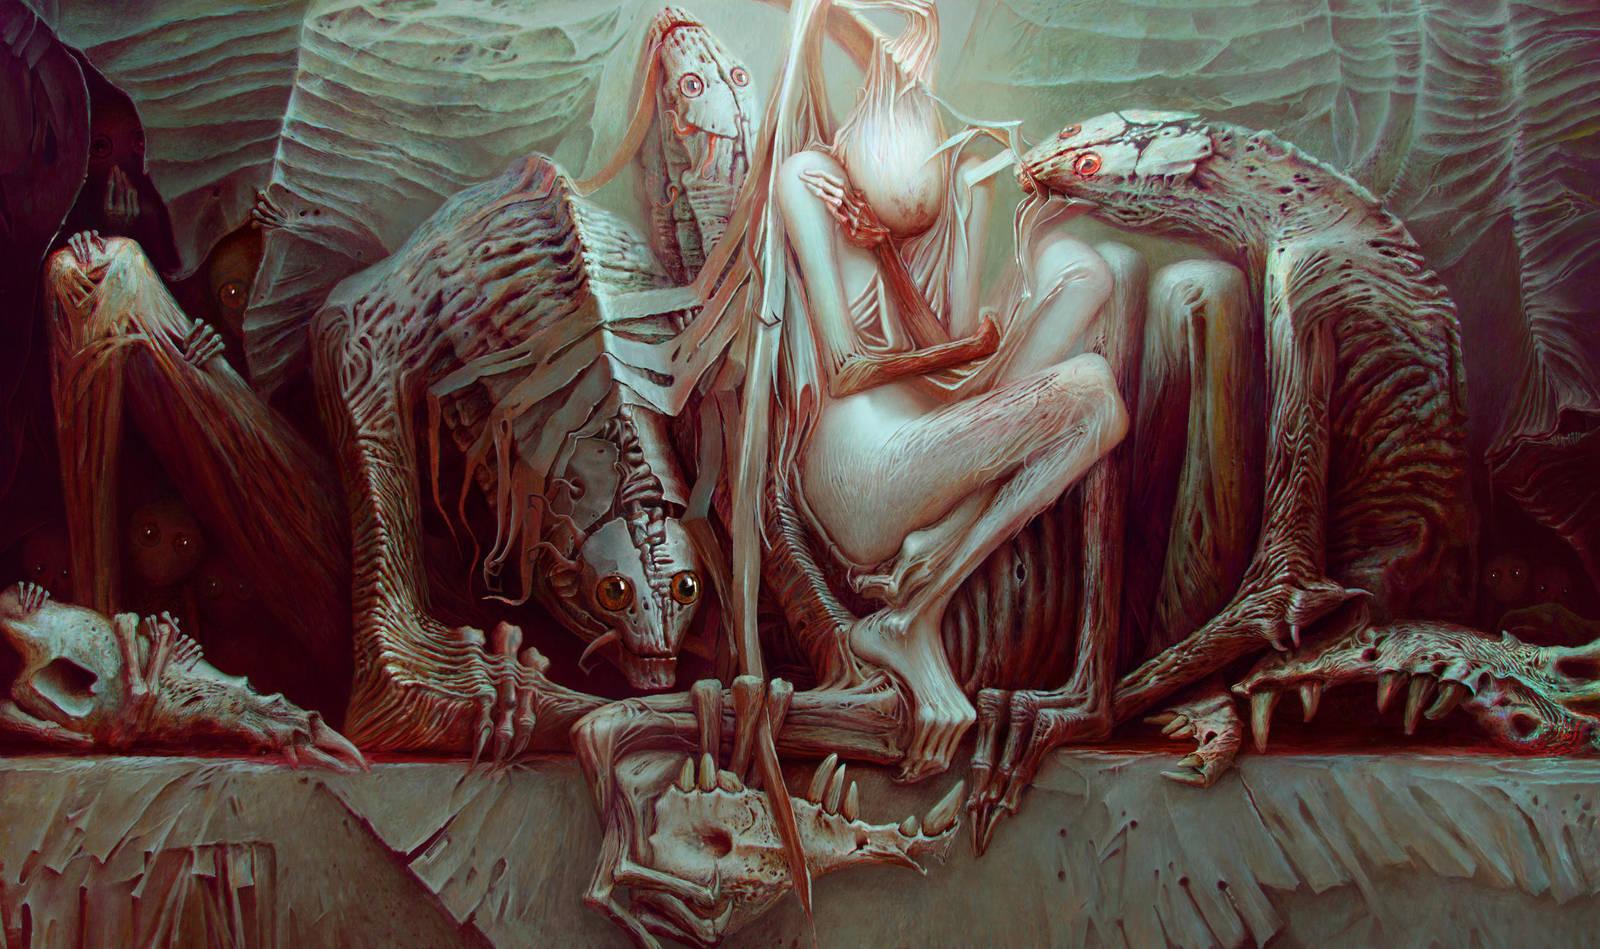 The fallen angel and the three guardian by kumpan